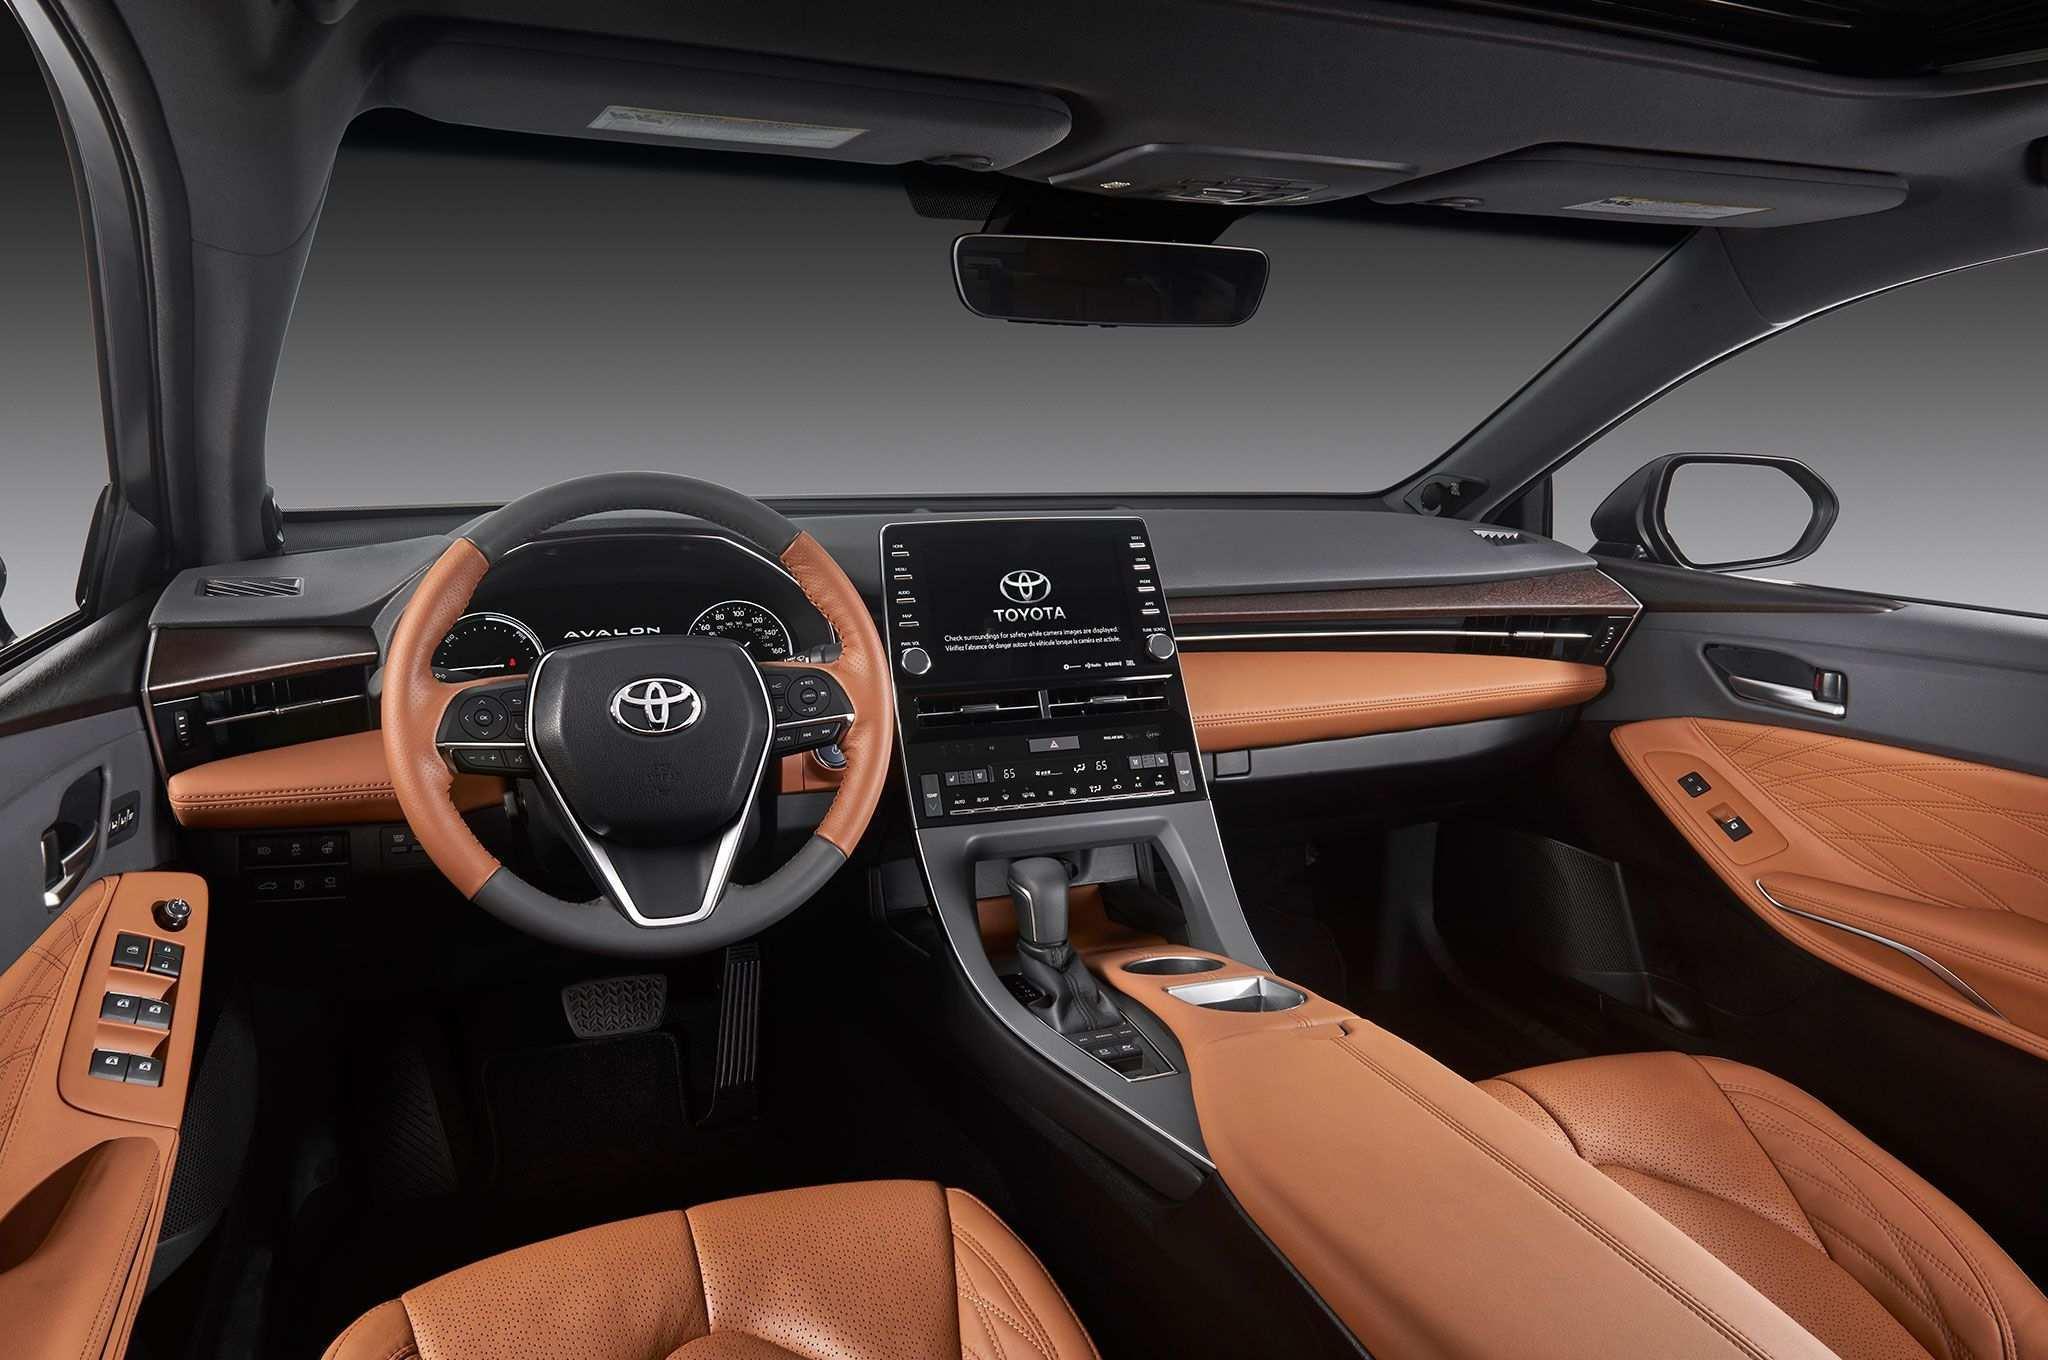 68 All New Best Avalon Toyota 2019 Interior Concept Speed Test for Best Avalon Toyota 2019 Interior Concept